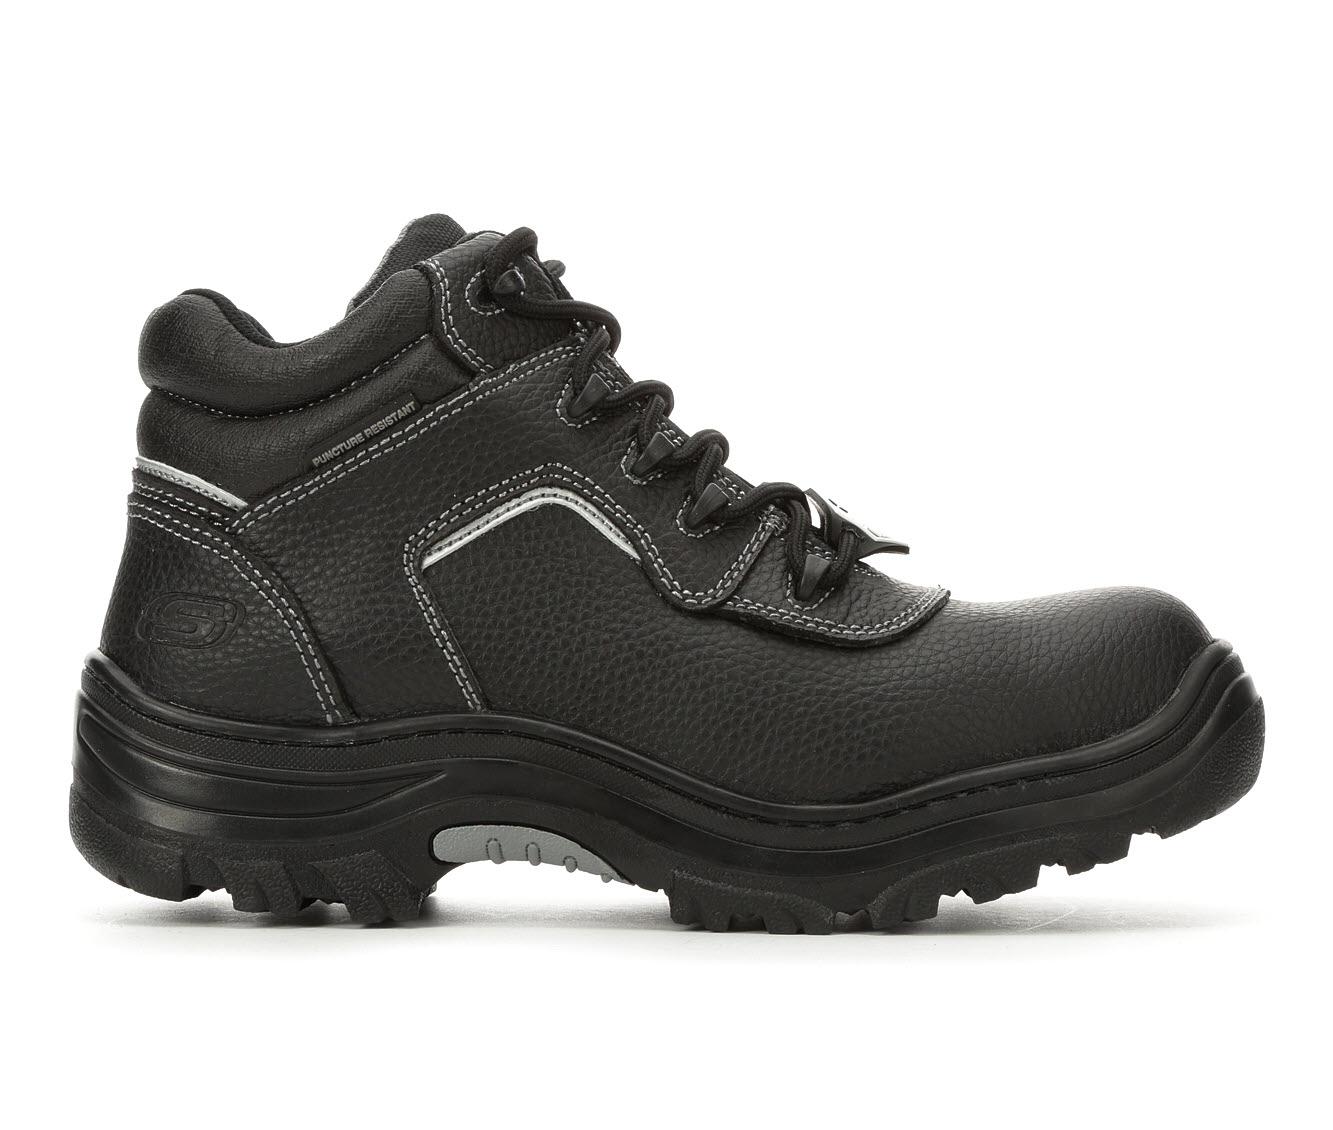 Skechers Work Workshire Burgin Sosder 77144 Men's Boots (Black Faux Leather)